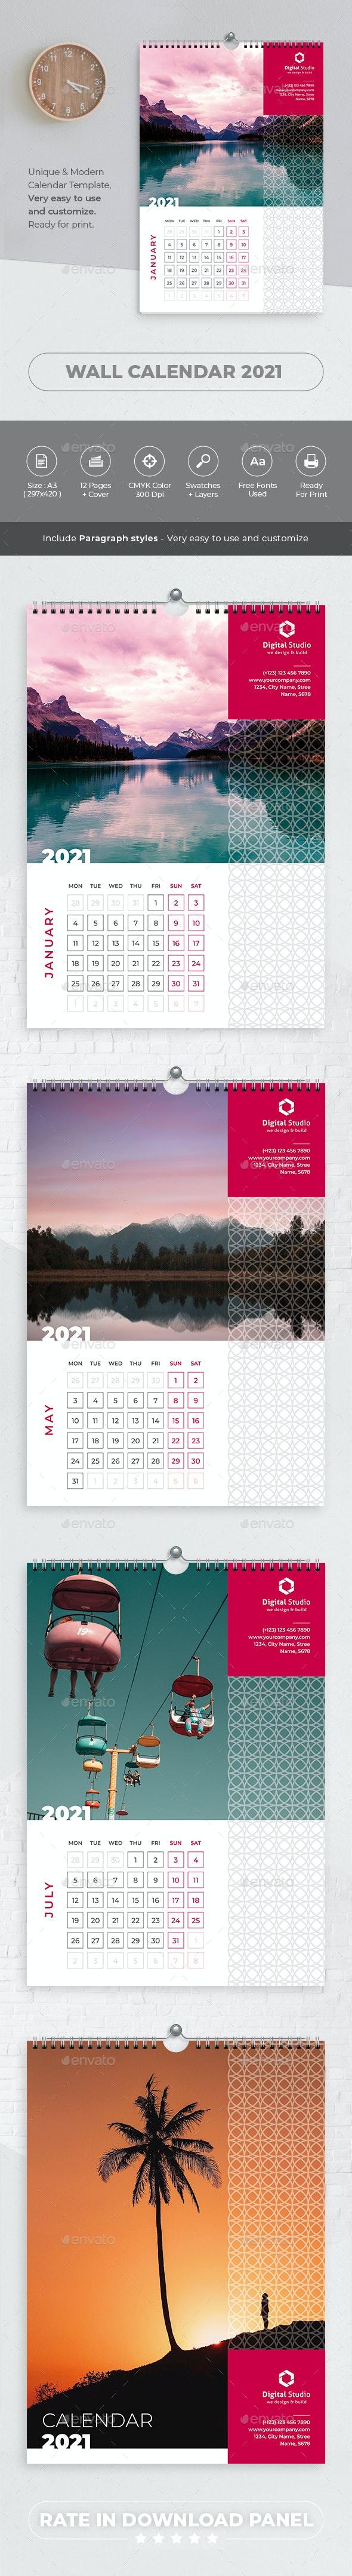 Wall Calendar 2021 - Calendars Stationery